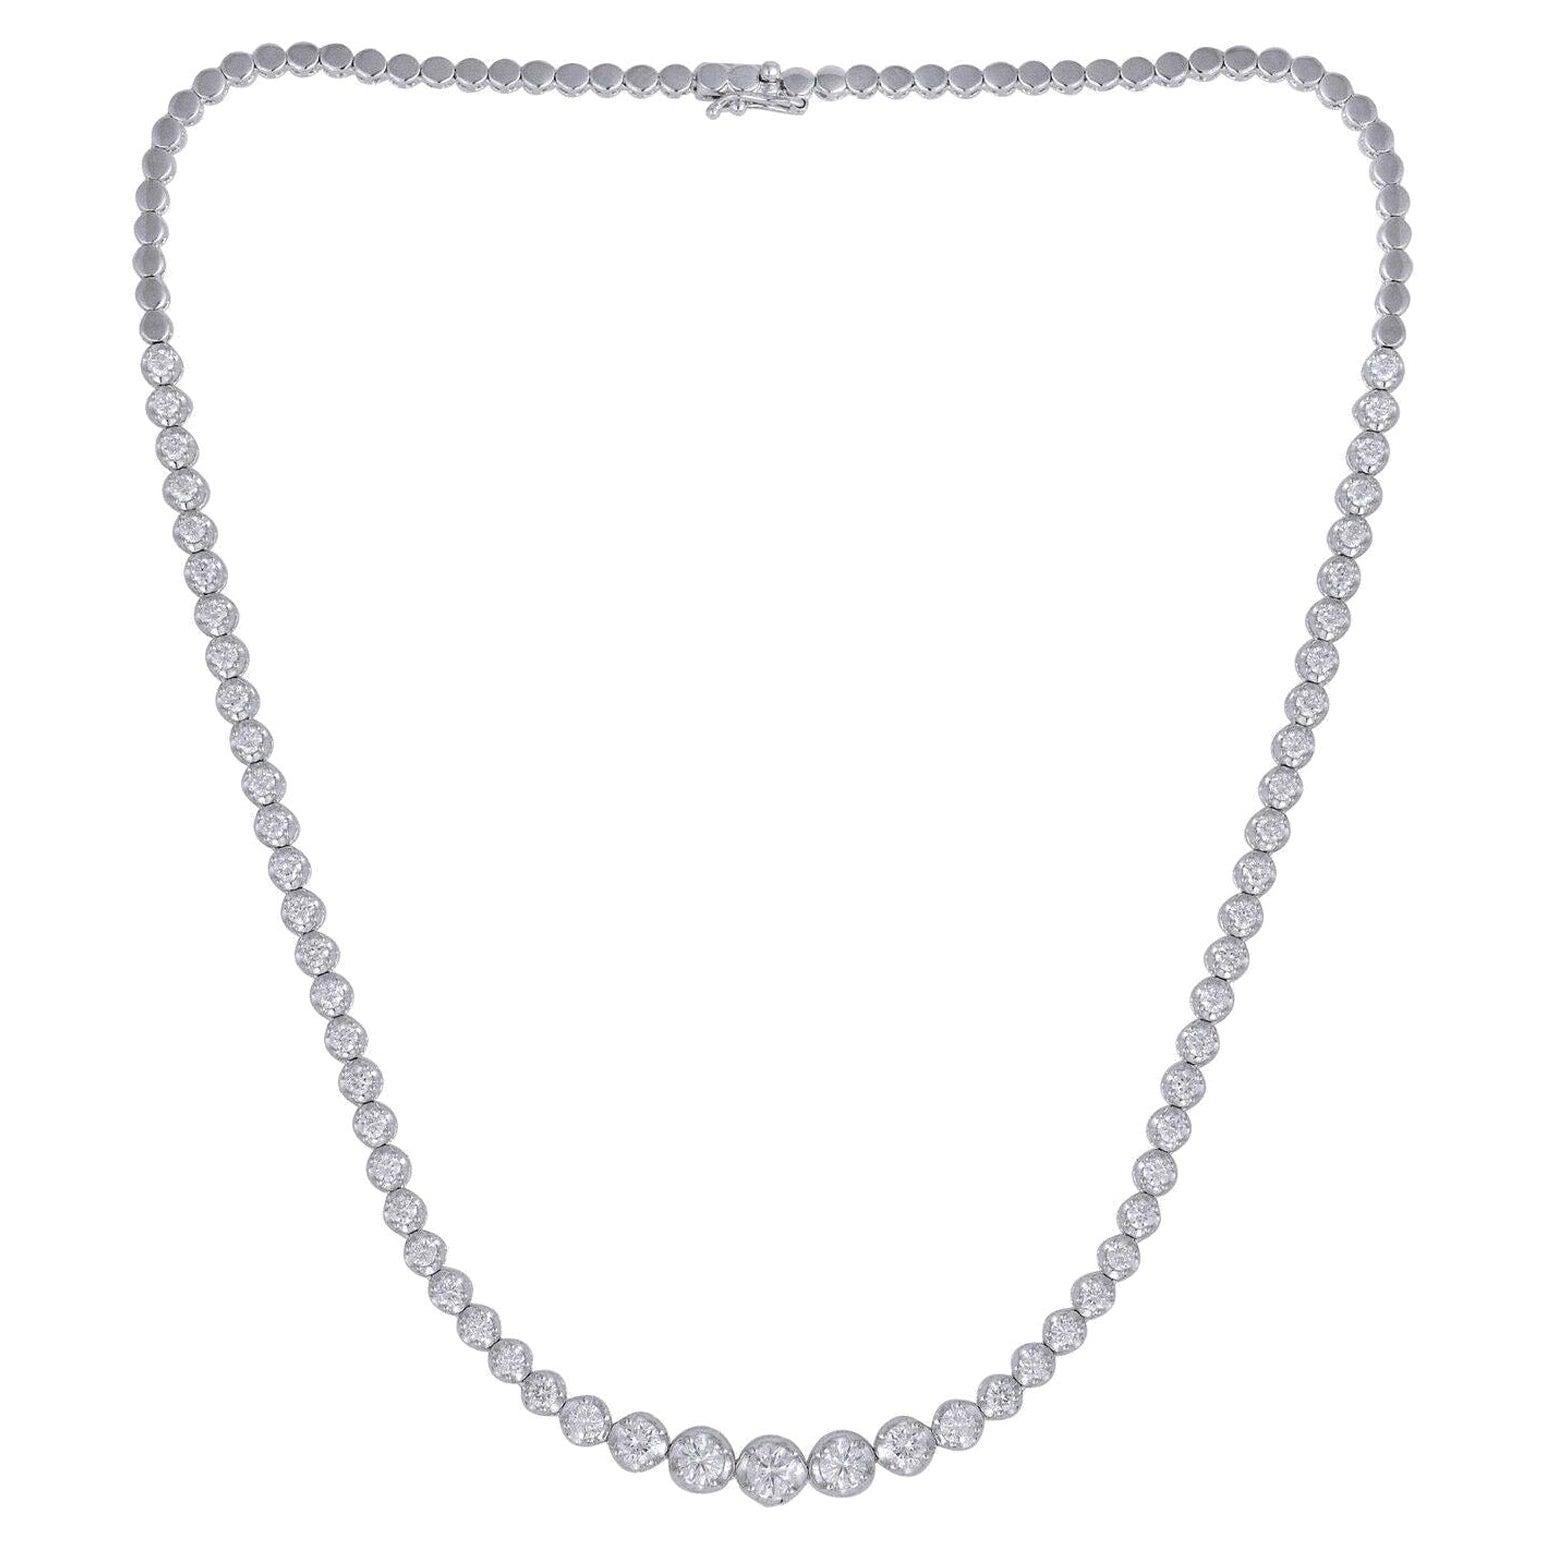 4.60 Carat Graduated Diamond 18 Karat White Gold Choker Necklace